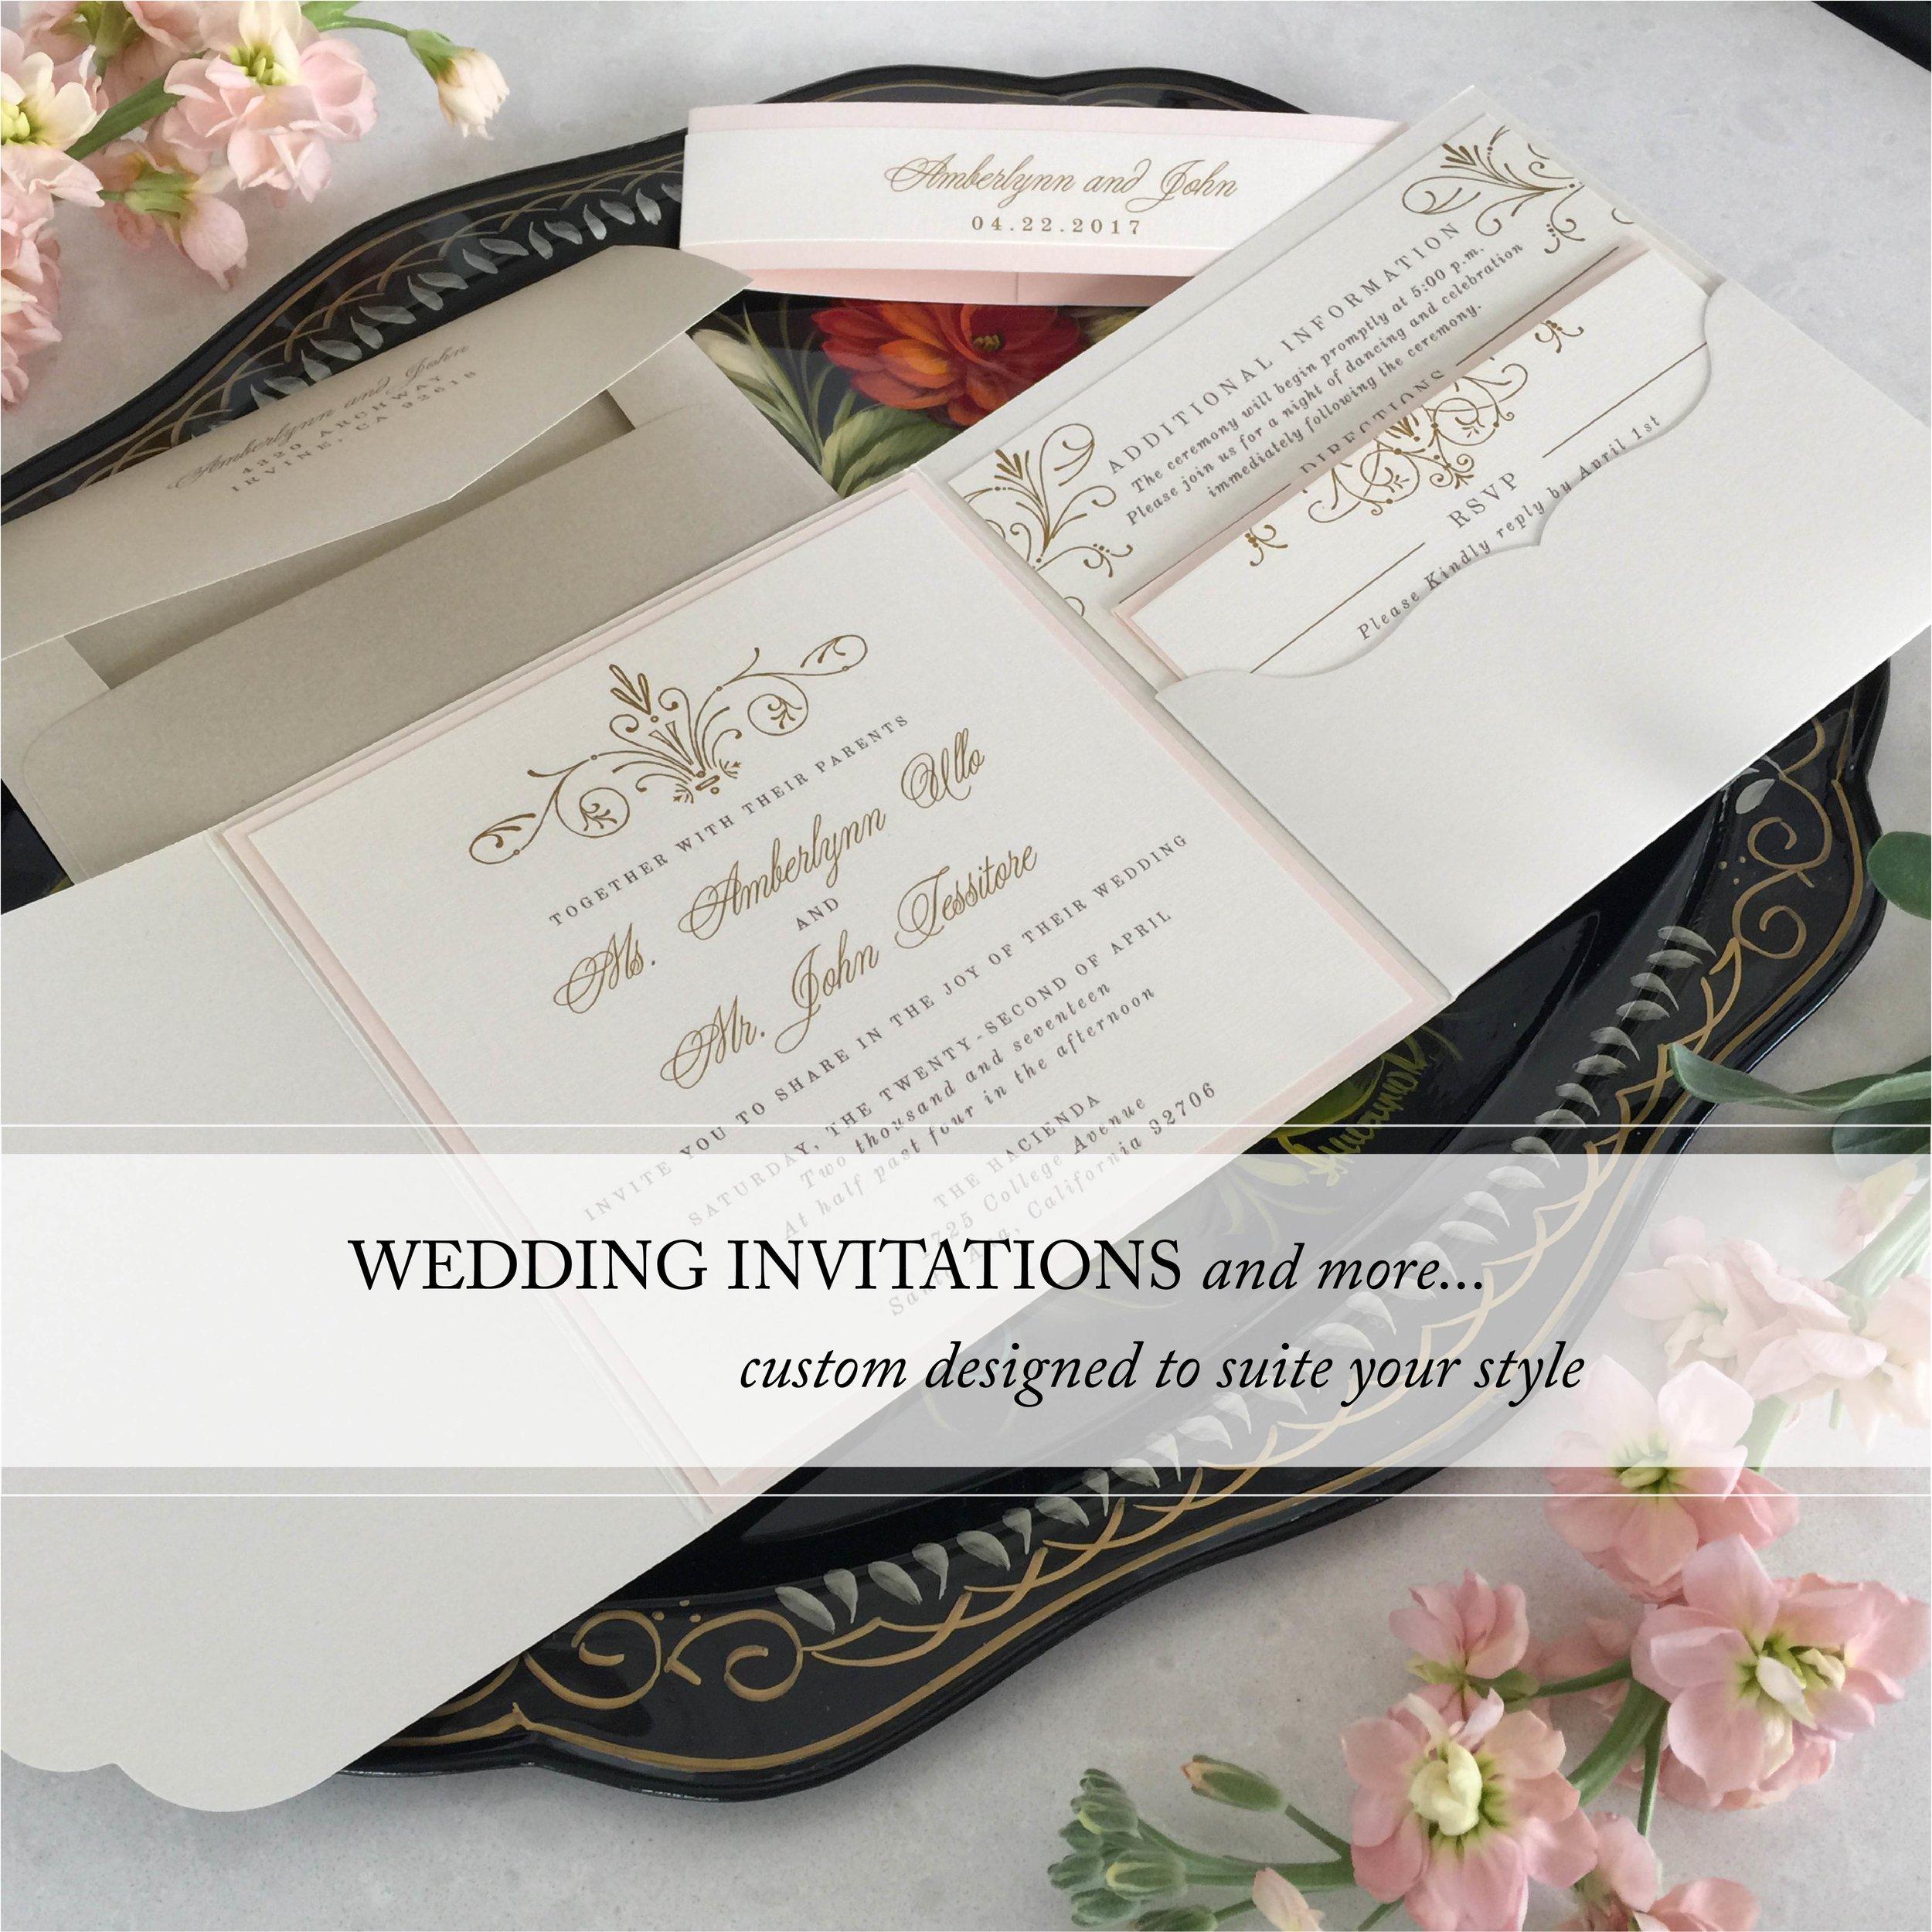 Gold and blush vintage wedding invitation banner-01.jpg